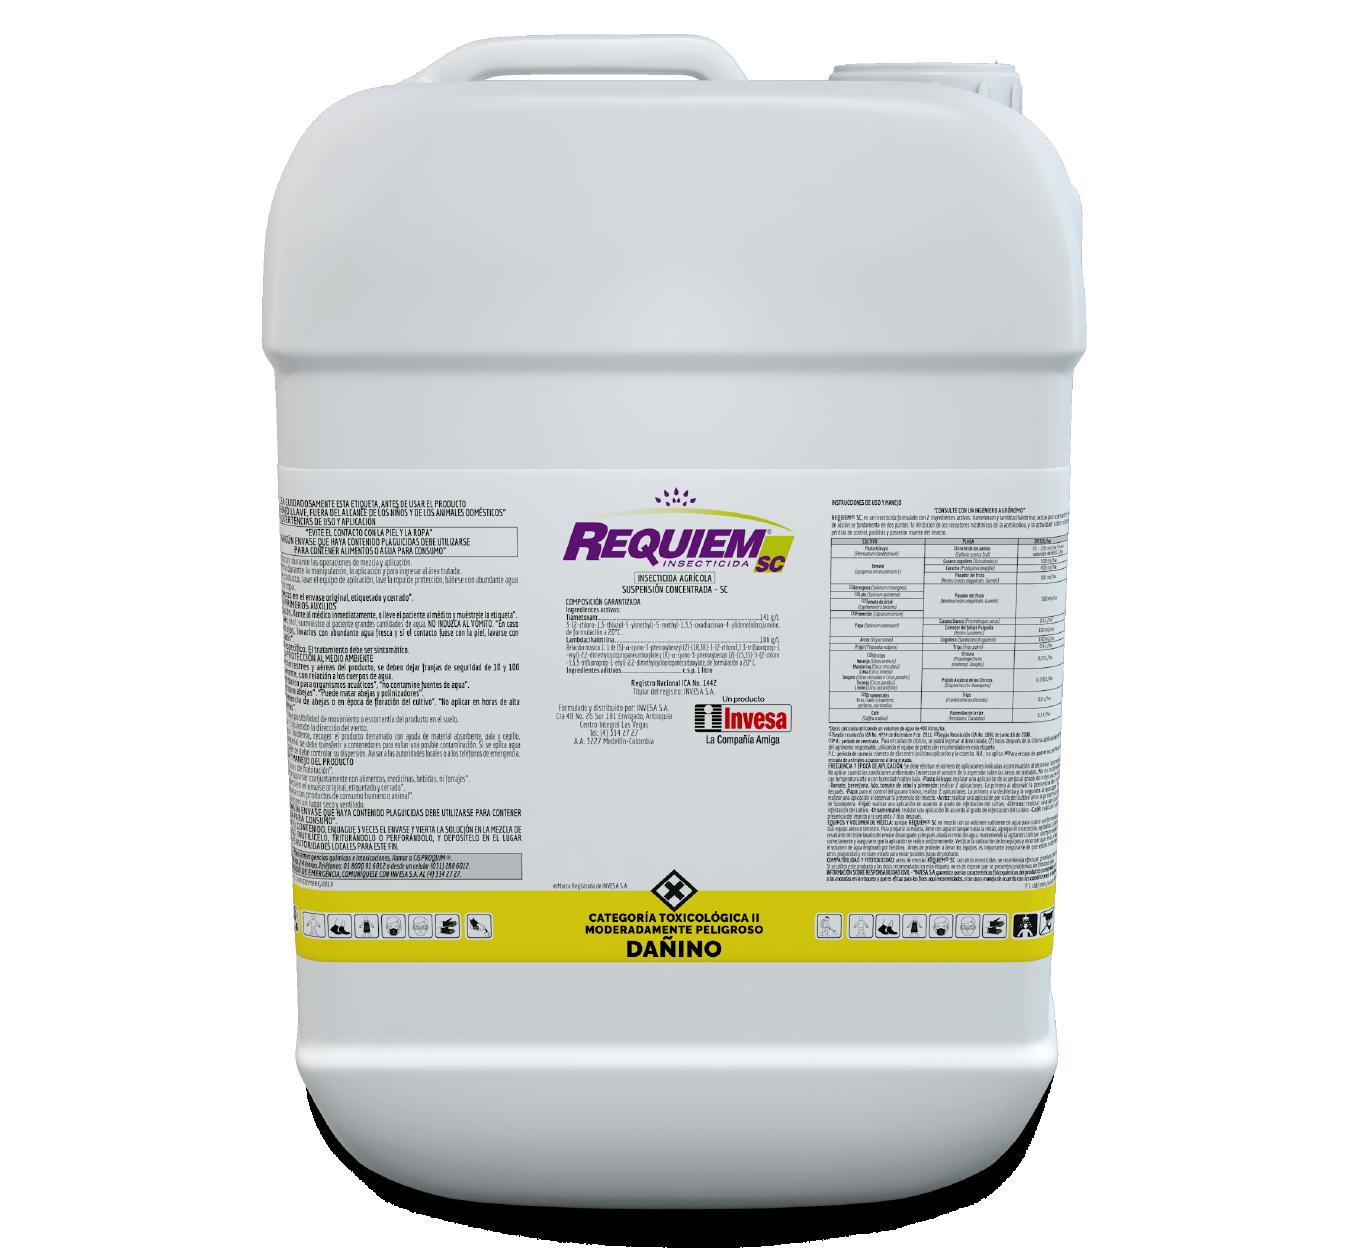 Insecticida requiem sc invesa 20 litrospng